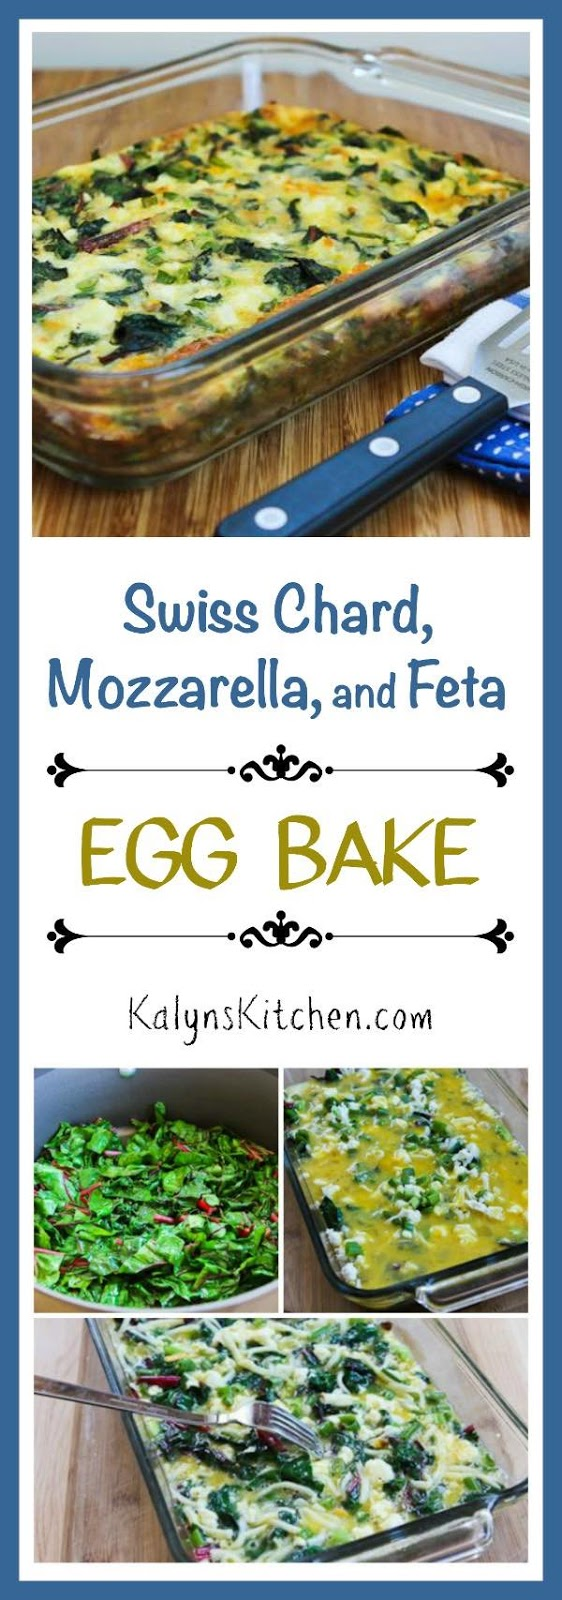 Swiss Chard, Mozzarella, and Feta Egg Bake - Kalyn's Kitchen